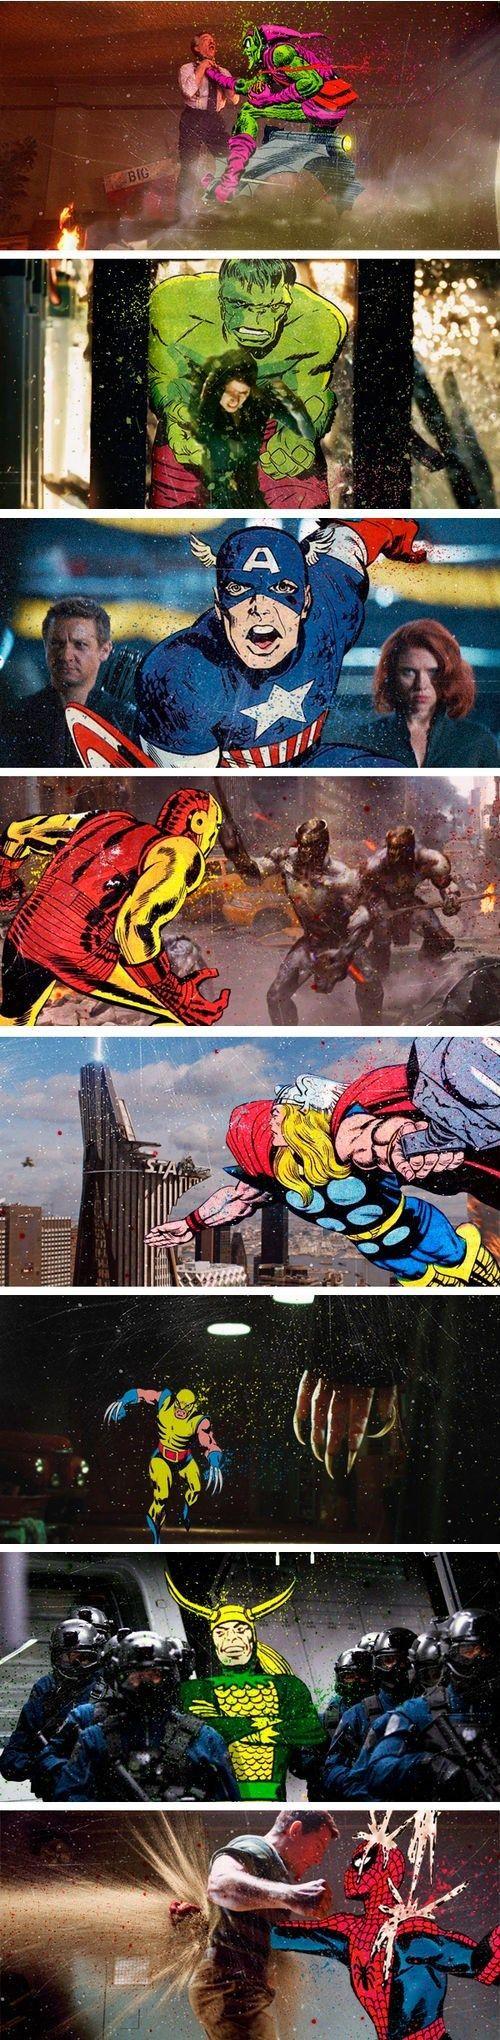 Marvel Comics In Marvel Movies